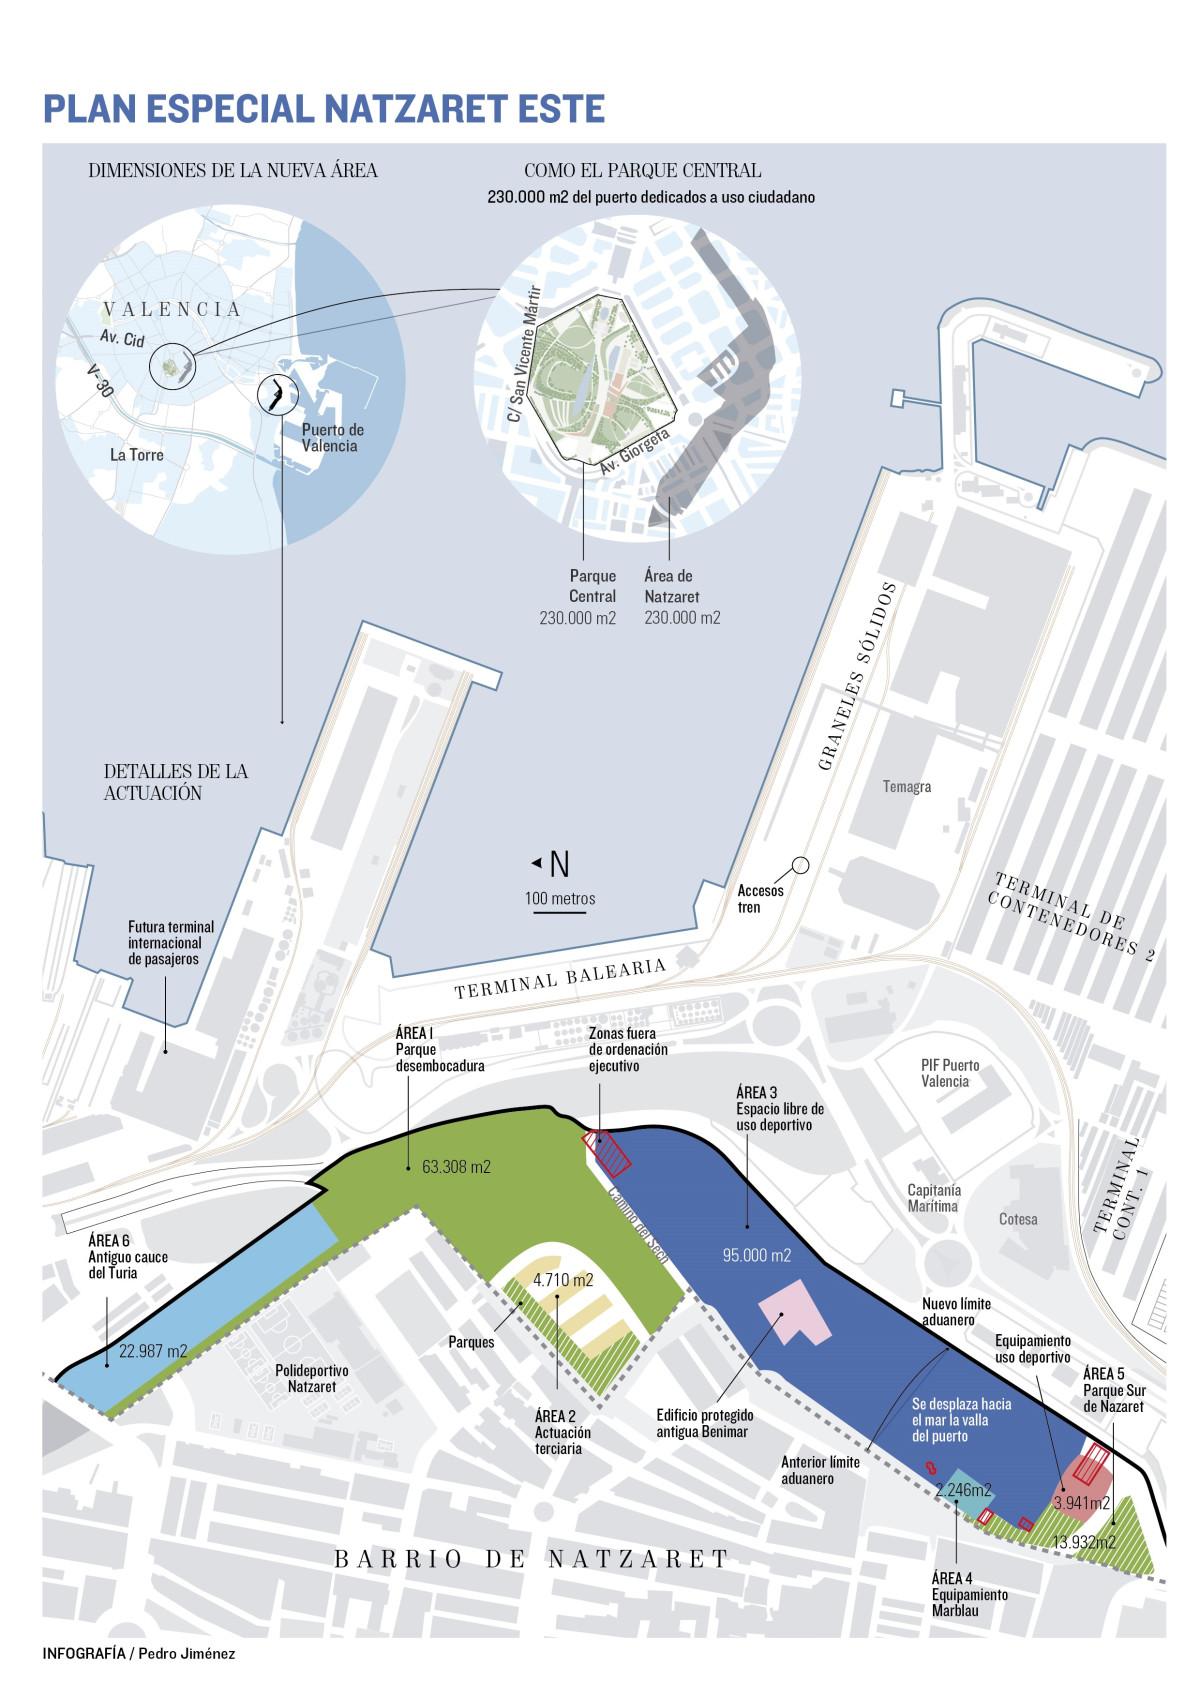 Valenciaport   plan especial nazaret este